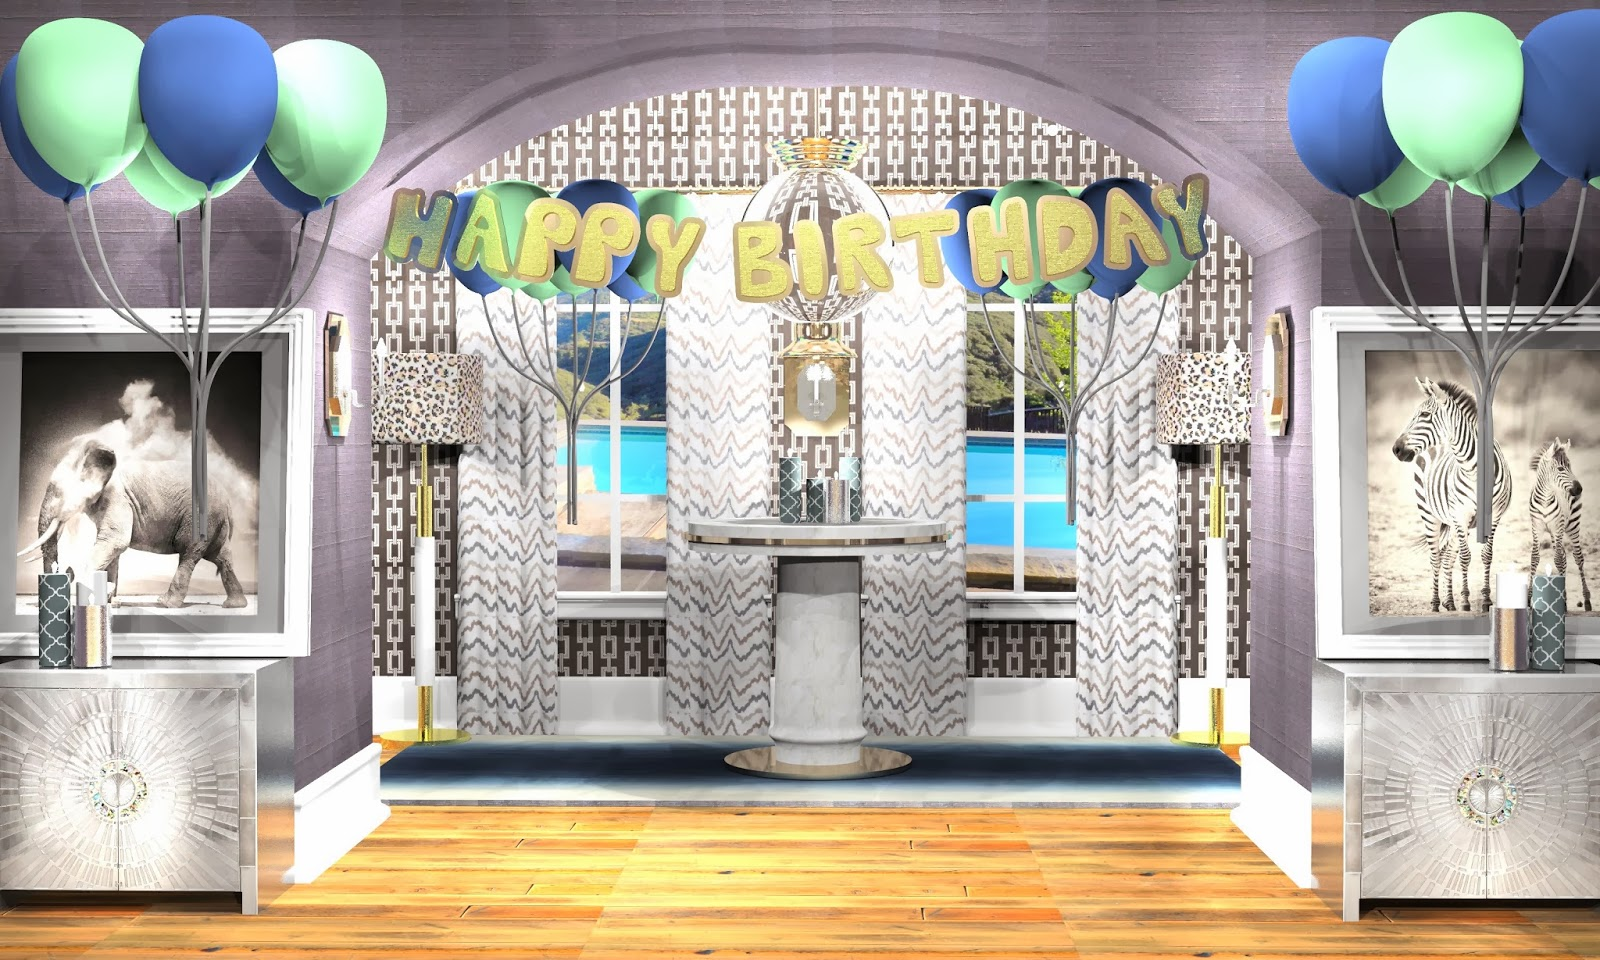 Happy Birthday Rendering